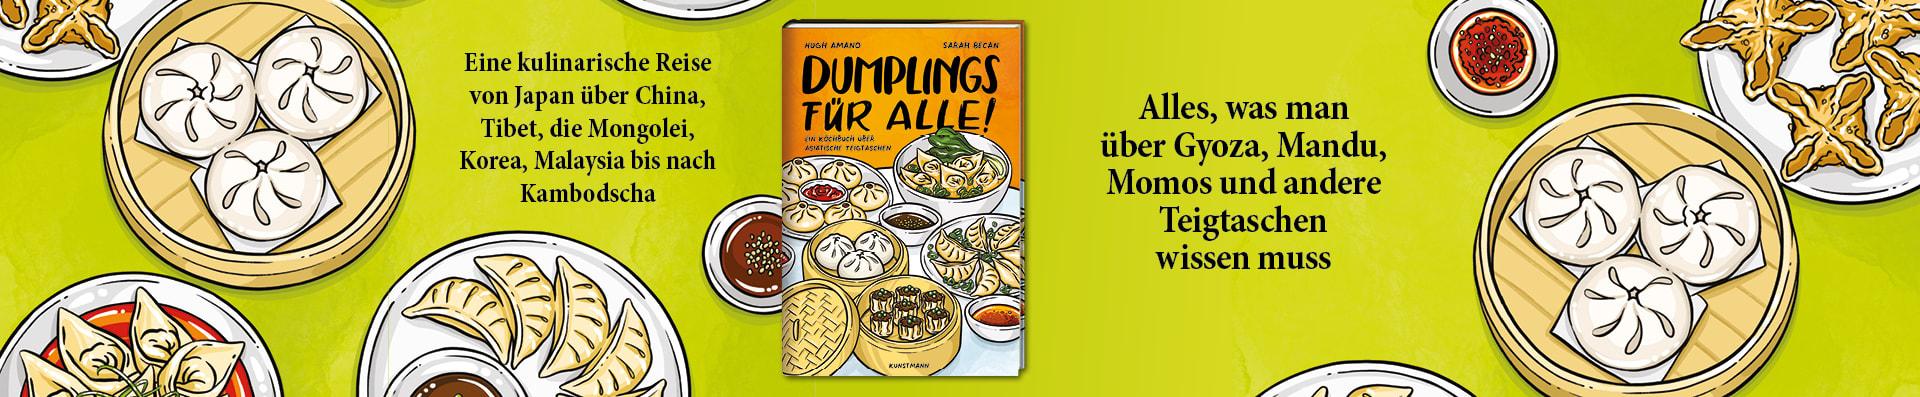 Hugh Amano / Sarah Becan – Dumplings für alle!